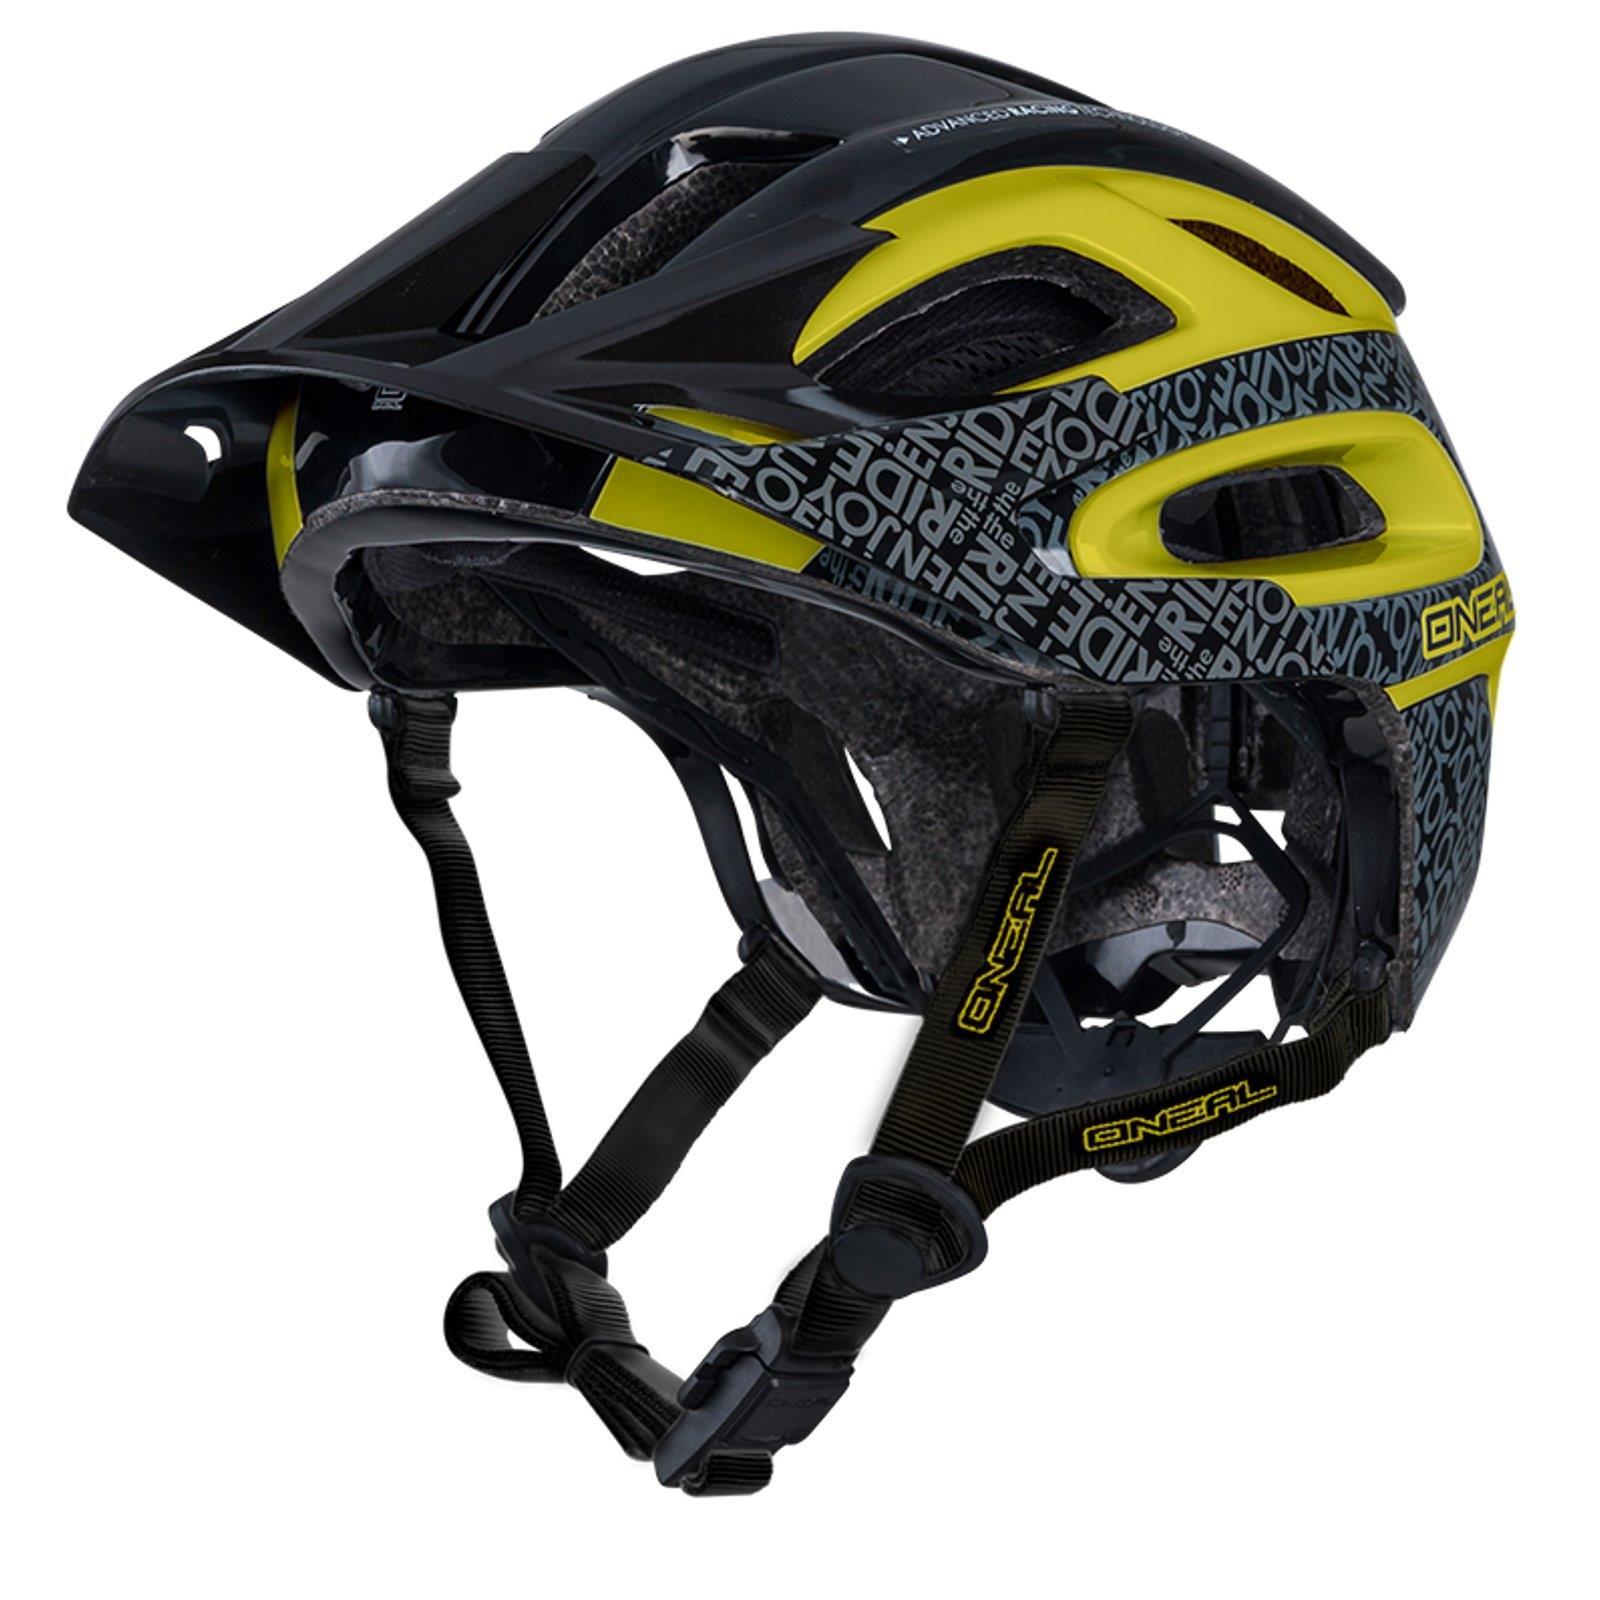 oneal orbiter ii fidlock fahrrad helm schwarz gelb mtb all. Black Bedroom Furniture Sets. Home Design Ideas